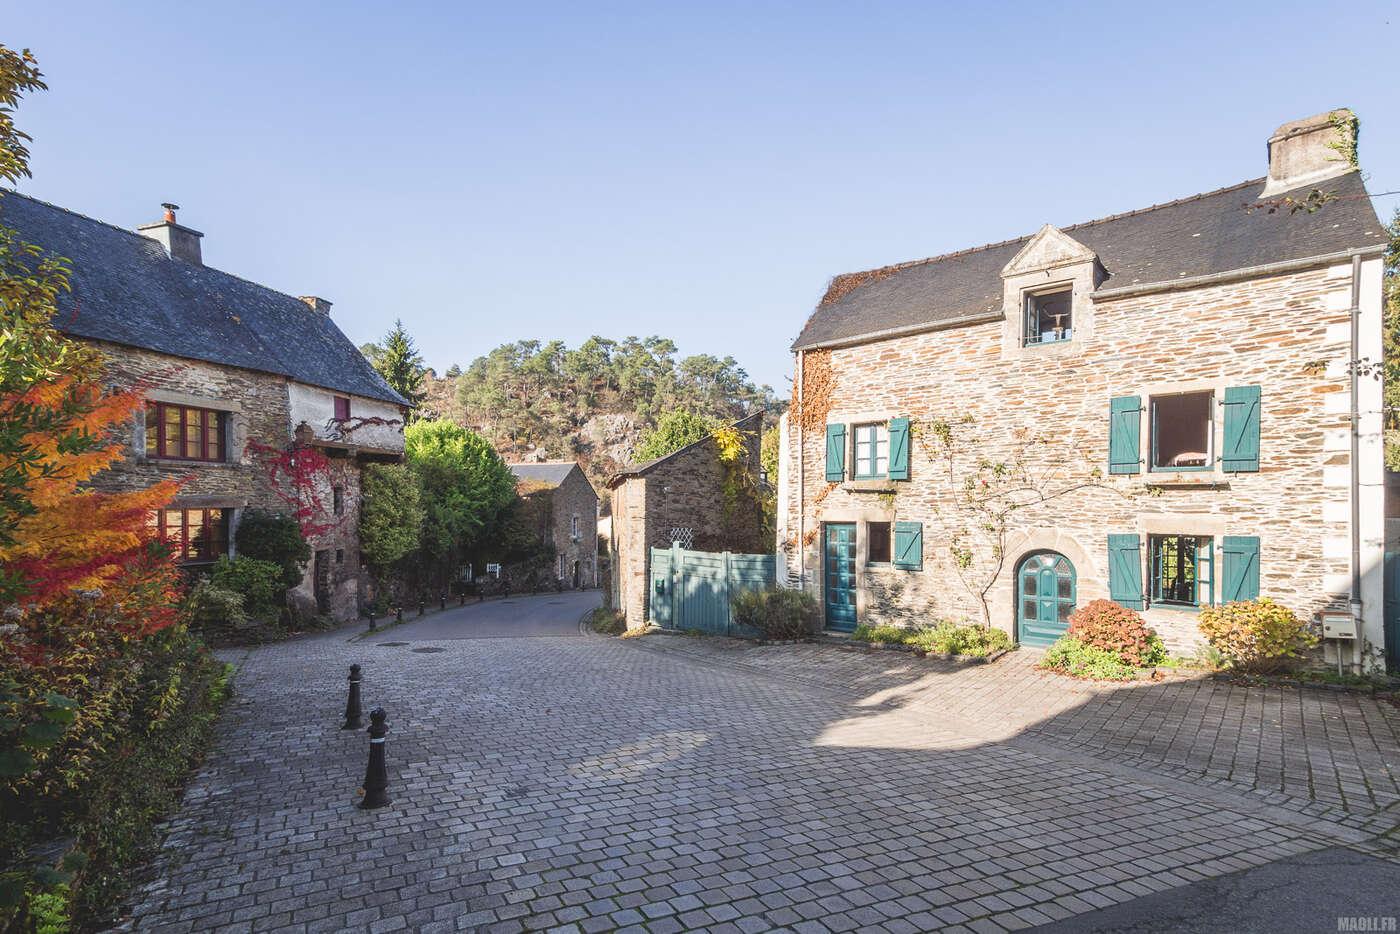 Rue du Vieux Bourg, Rochefort-en-Terre